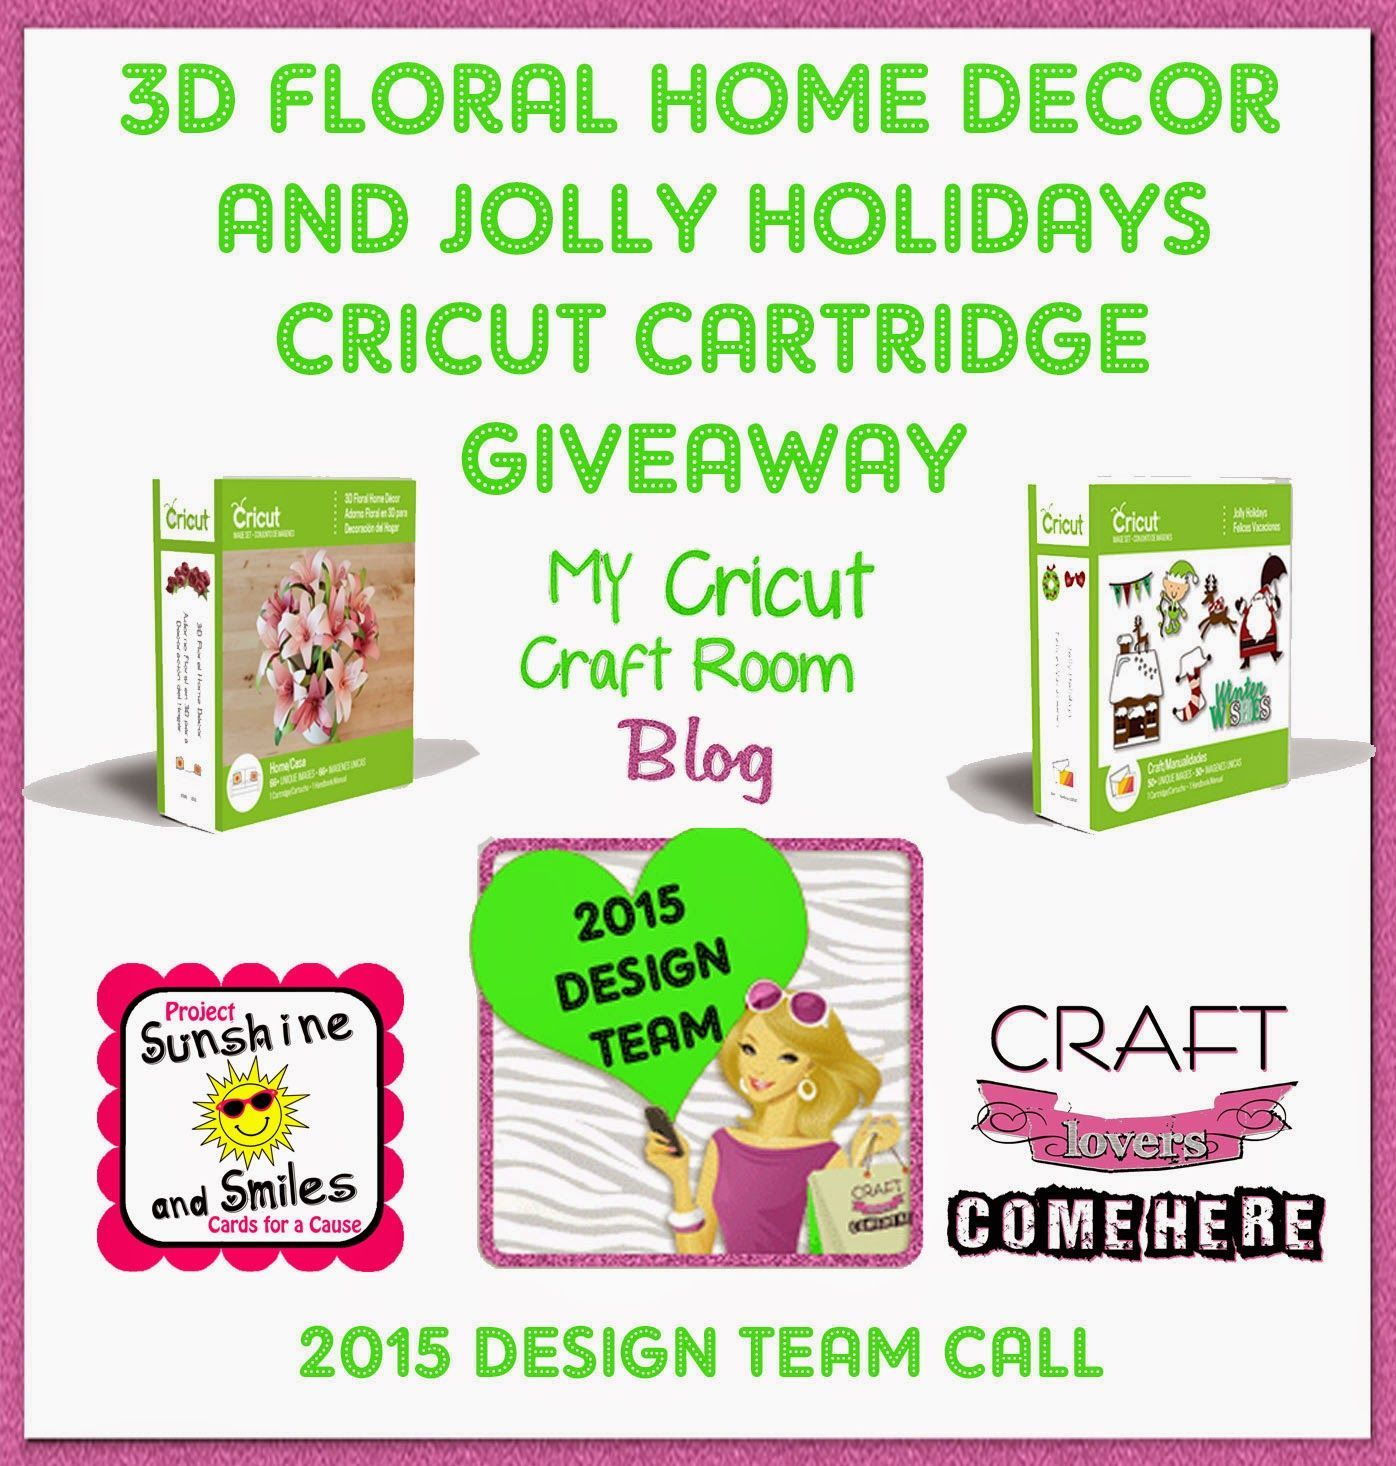 Cricut 3D Floral Home Décor and  Jolly Holidays Cricut Cartridge Giveaway.  And Design Team Call. http://www.mycricutcraftroom.blogspot.com/2015/04/giveaway-and-design-team-call.html